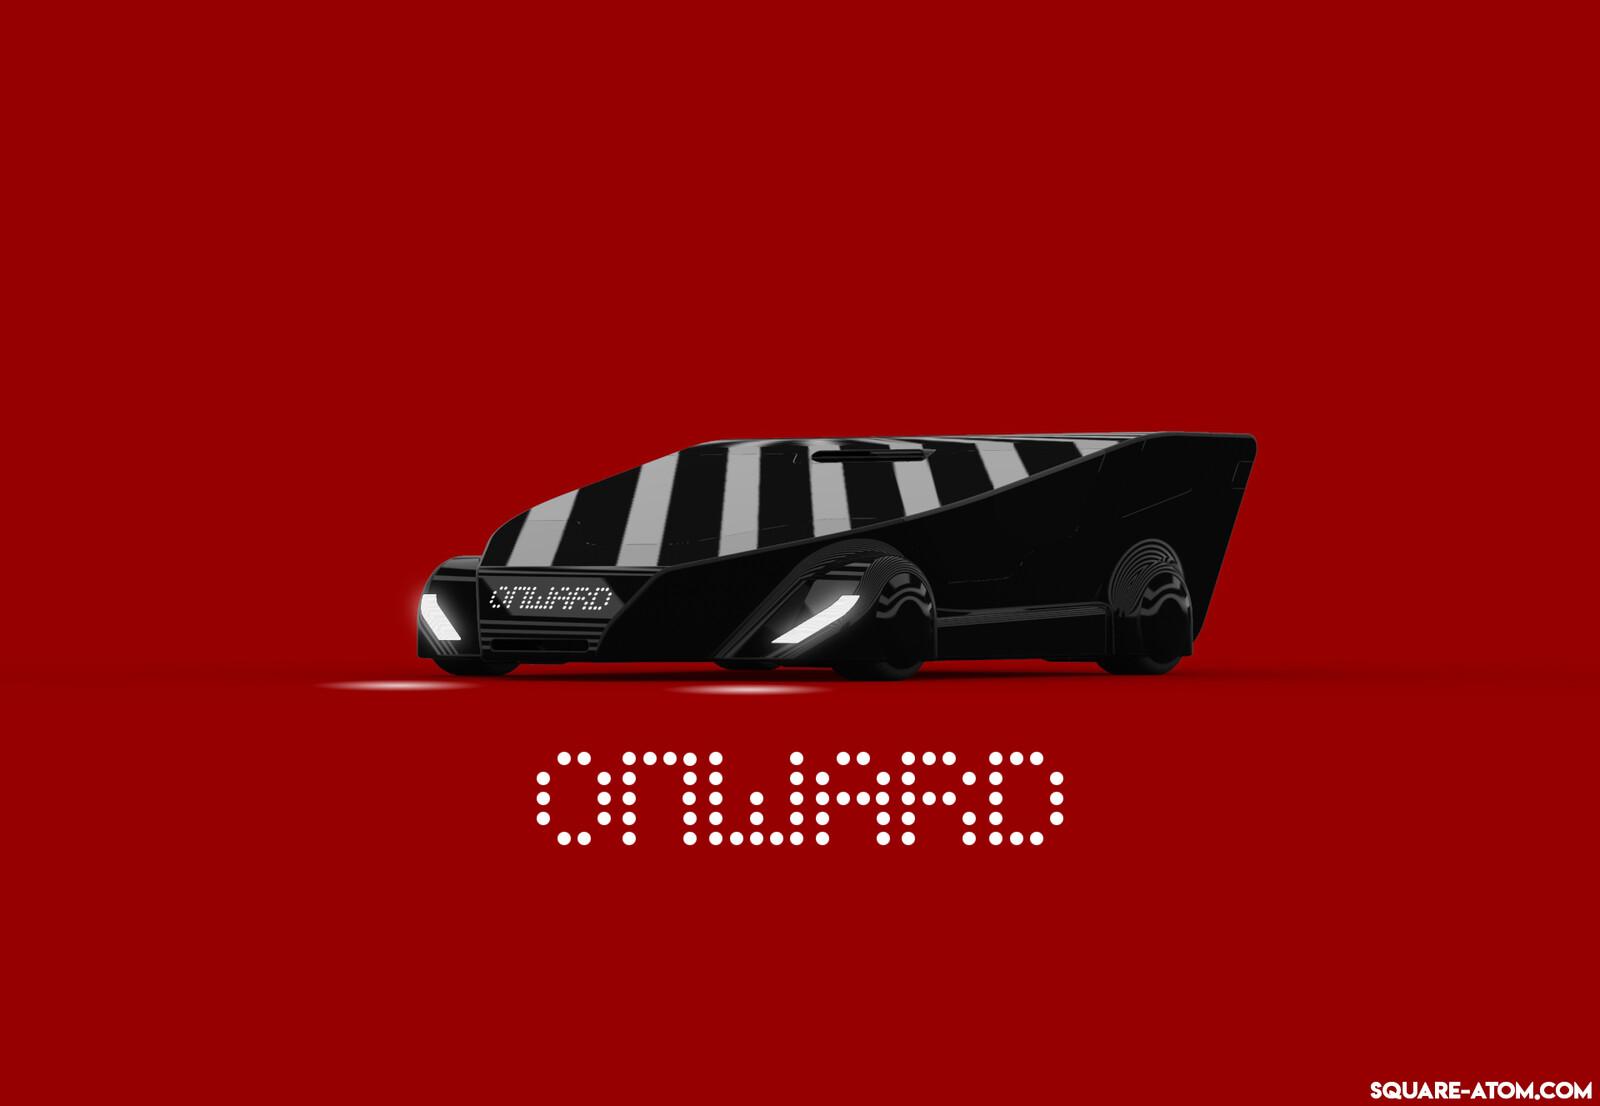 ONWARD - a car design